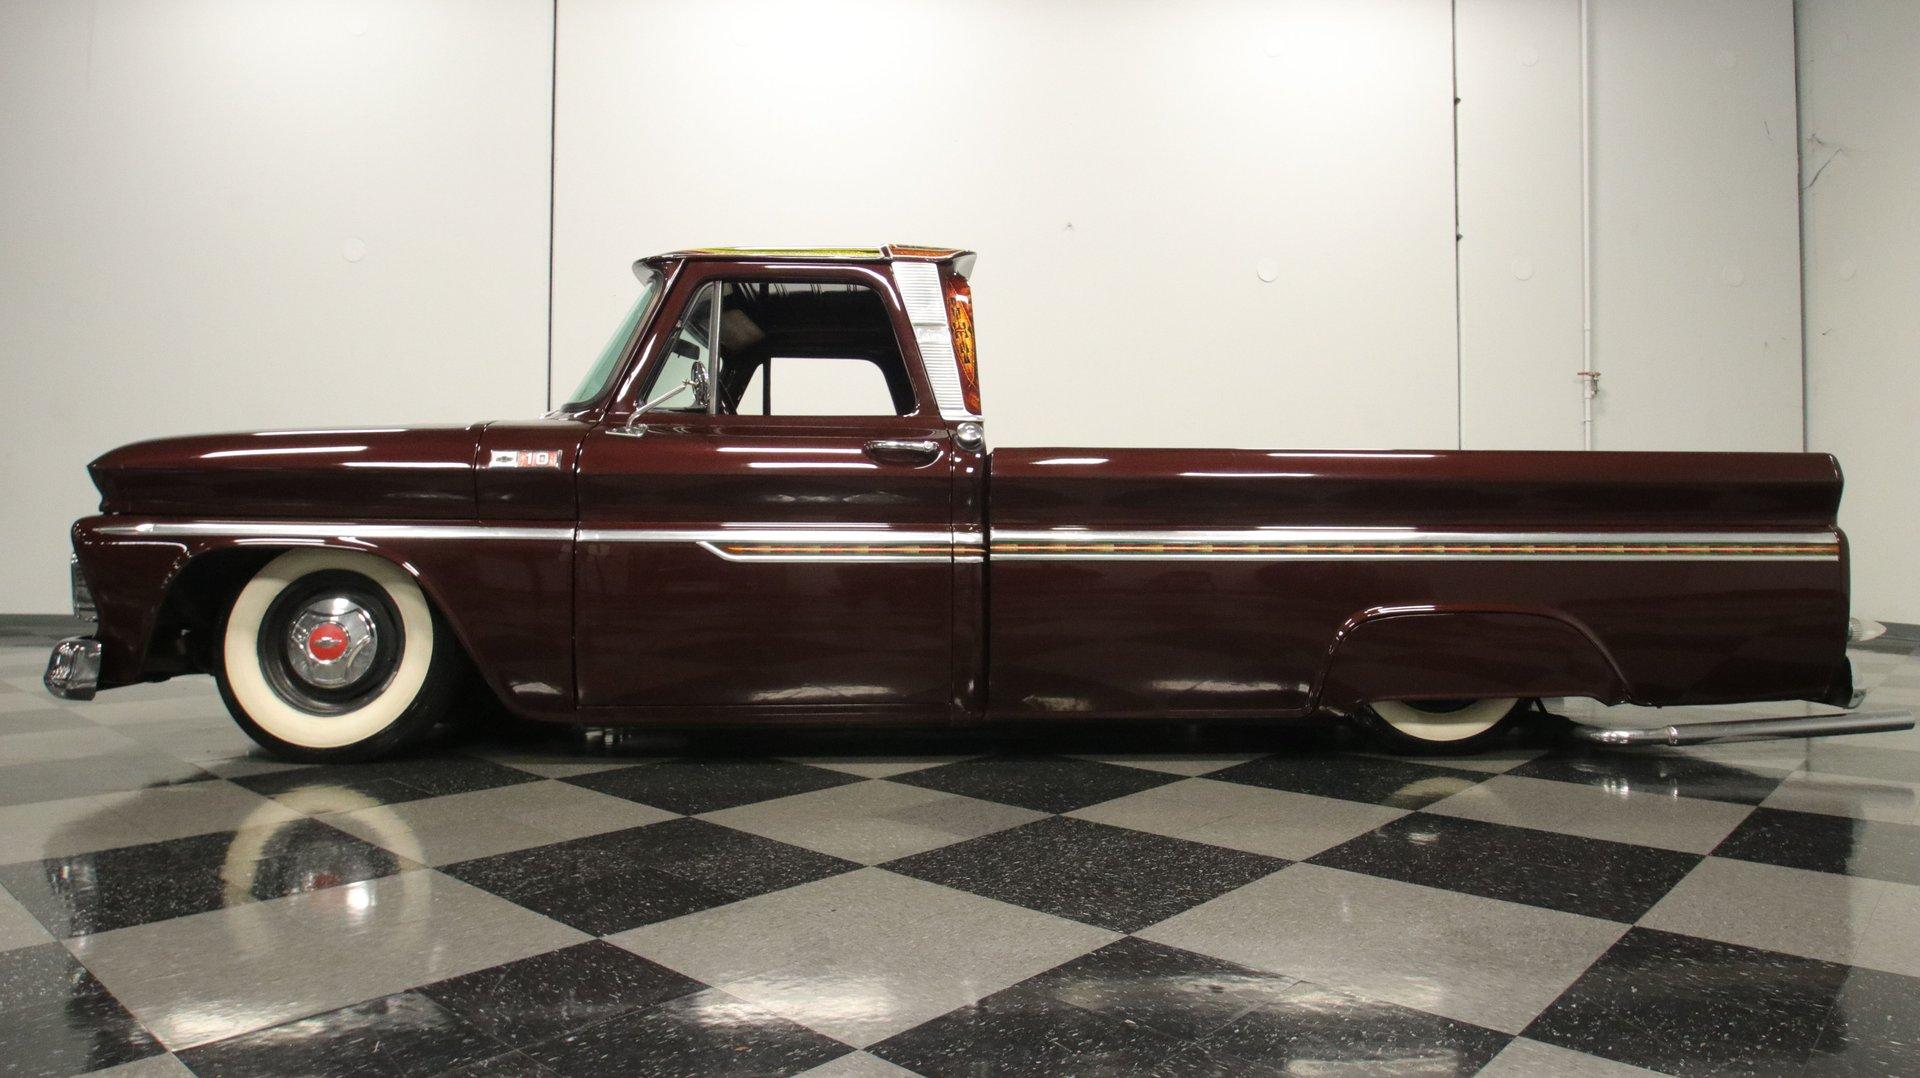 1965 chevrolet c10 lowrider